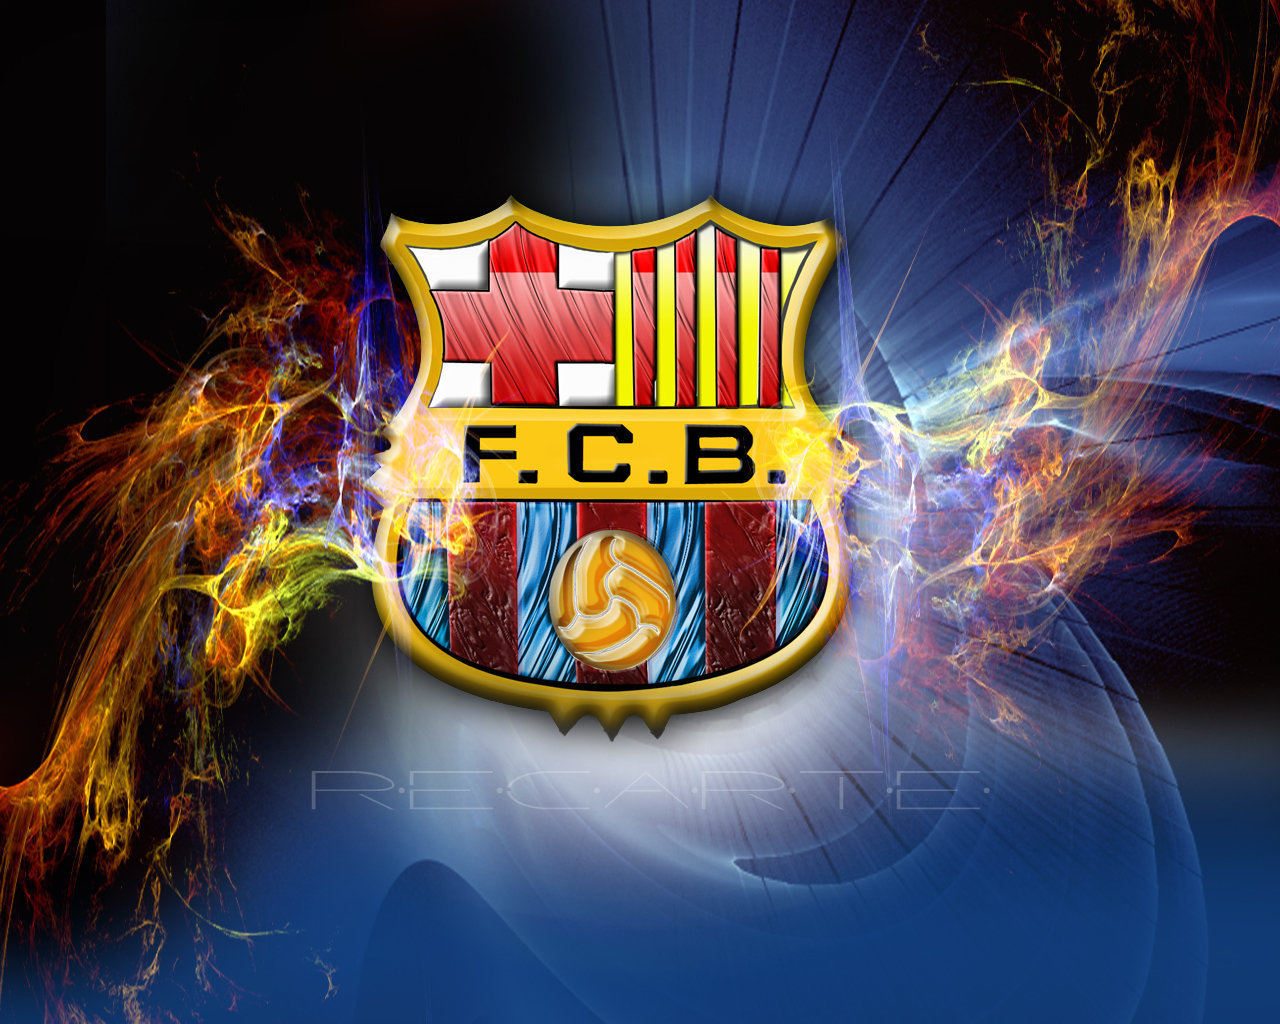 http://4.bp.blogspot.com/-GXg2UVl7UfI/UHWPz19dyZI/AAAAAAAAD58/vN2hMuD4GbI/s1600/FC+Barcelona+hd+wallpaper+2012-2013+04.jpg